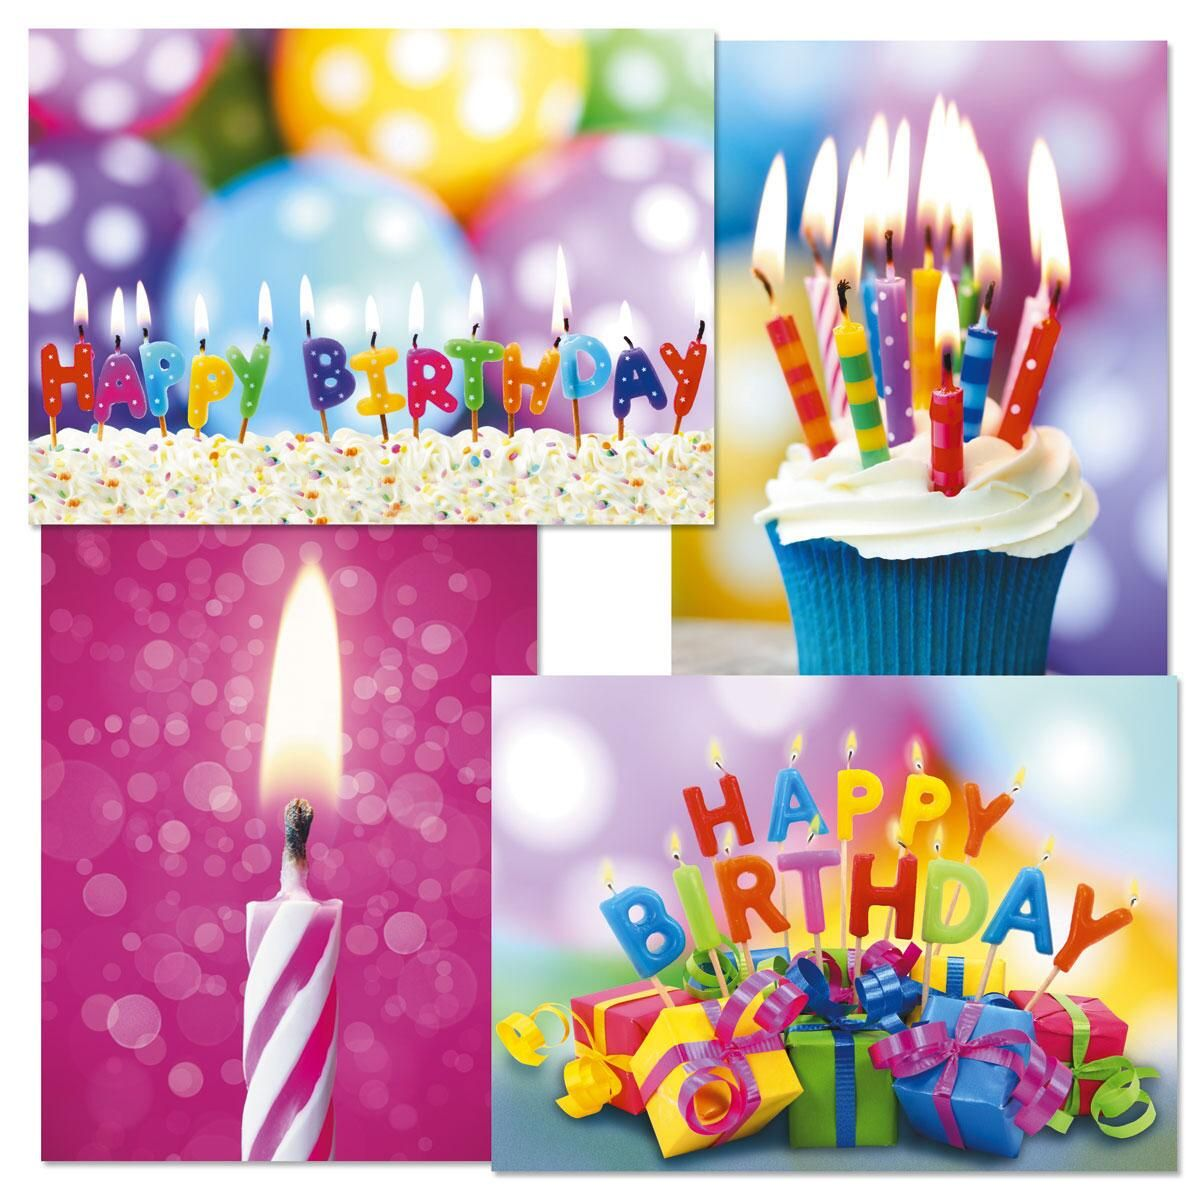 Make a Wish Birthday Cards & Seals